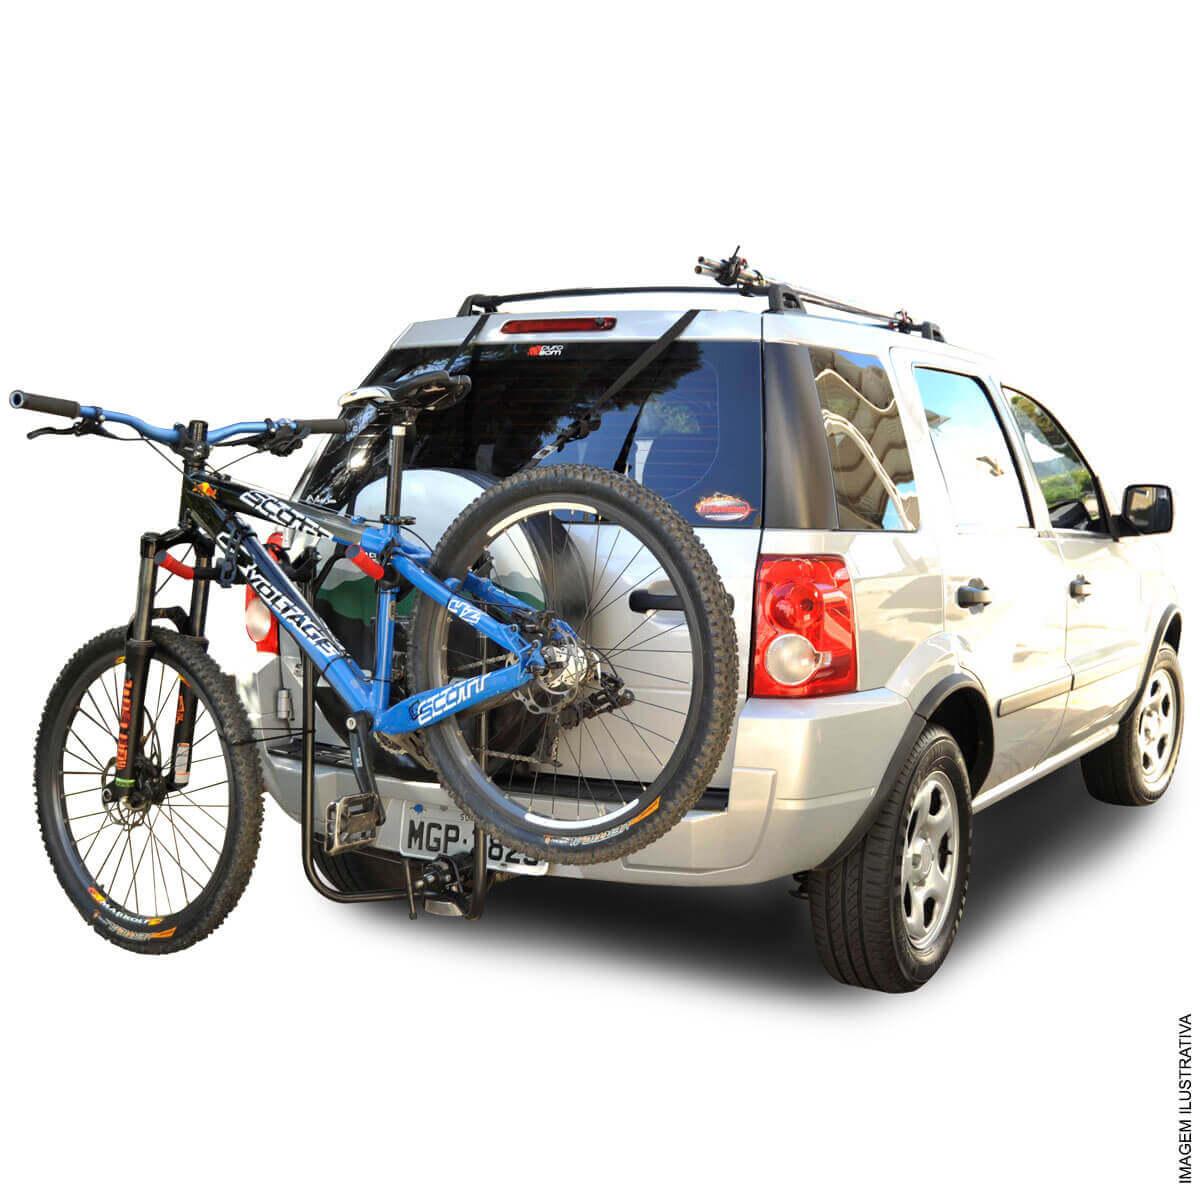 Transbike Pajero TR4 2003 a 2015 fixado no engate de reboque para 3 bicicletas